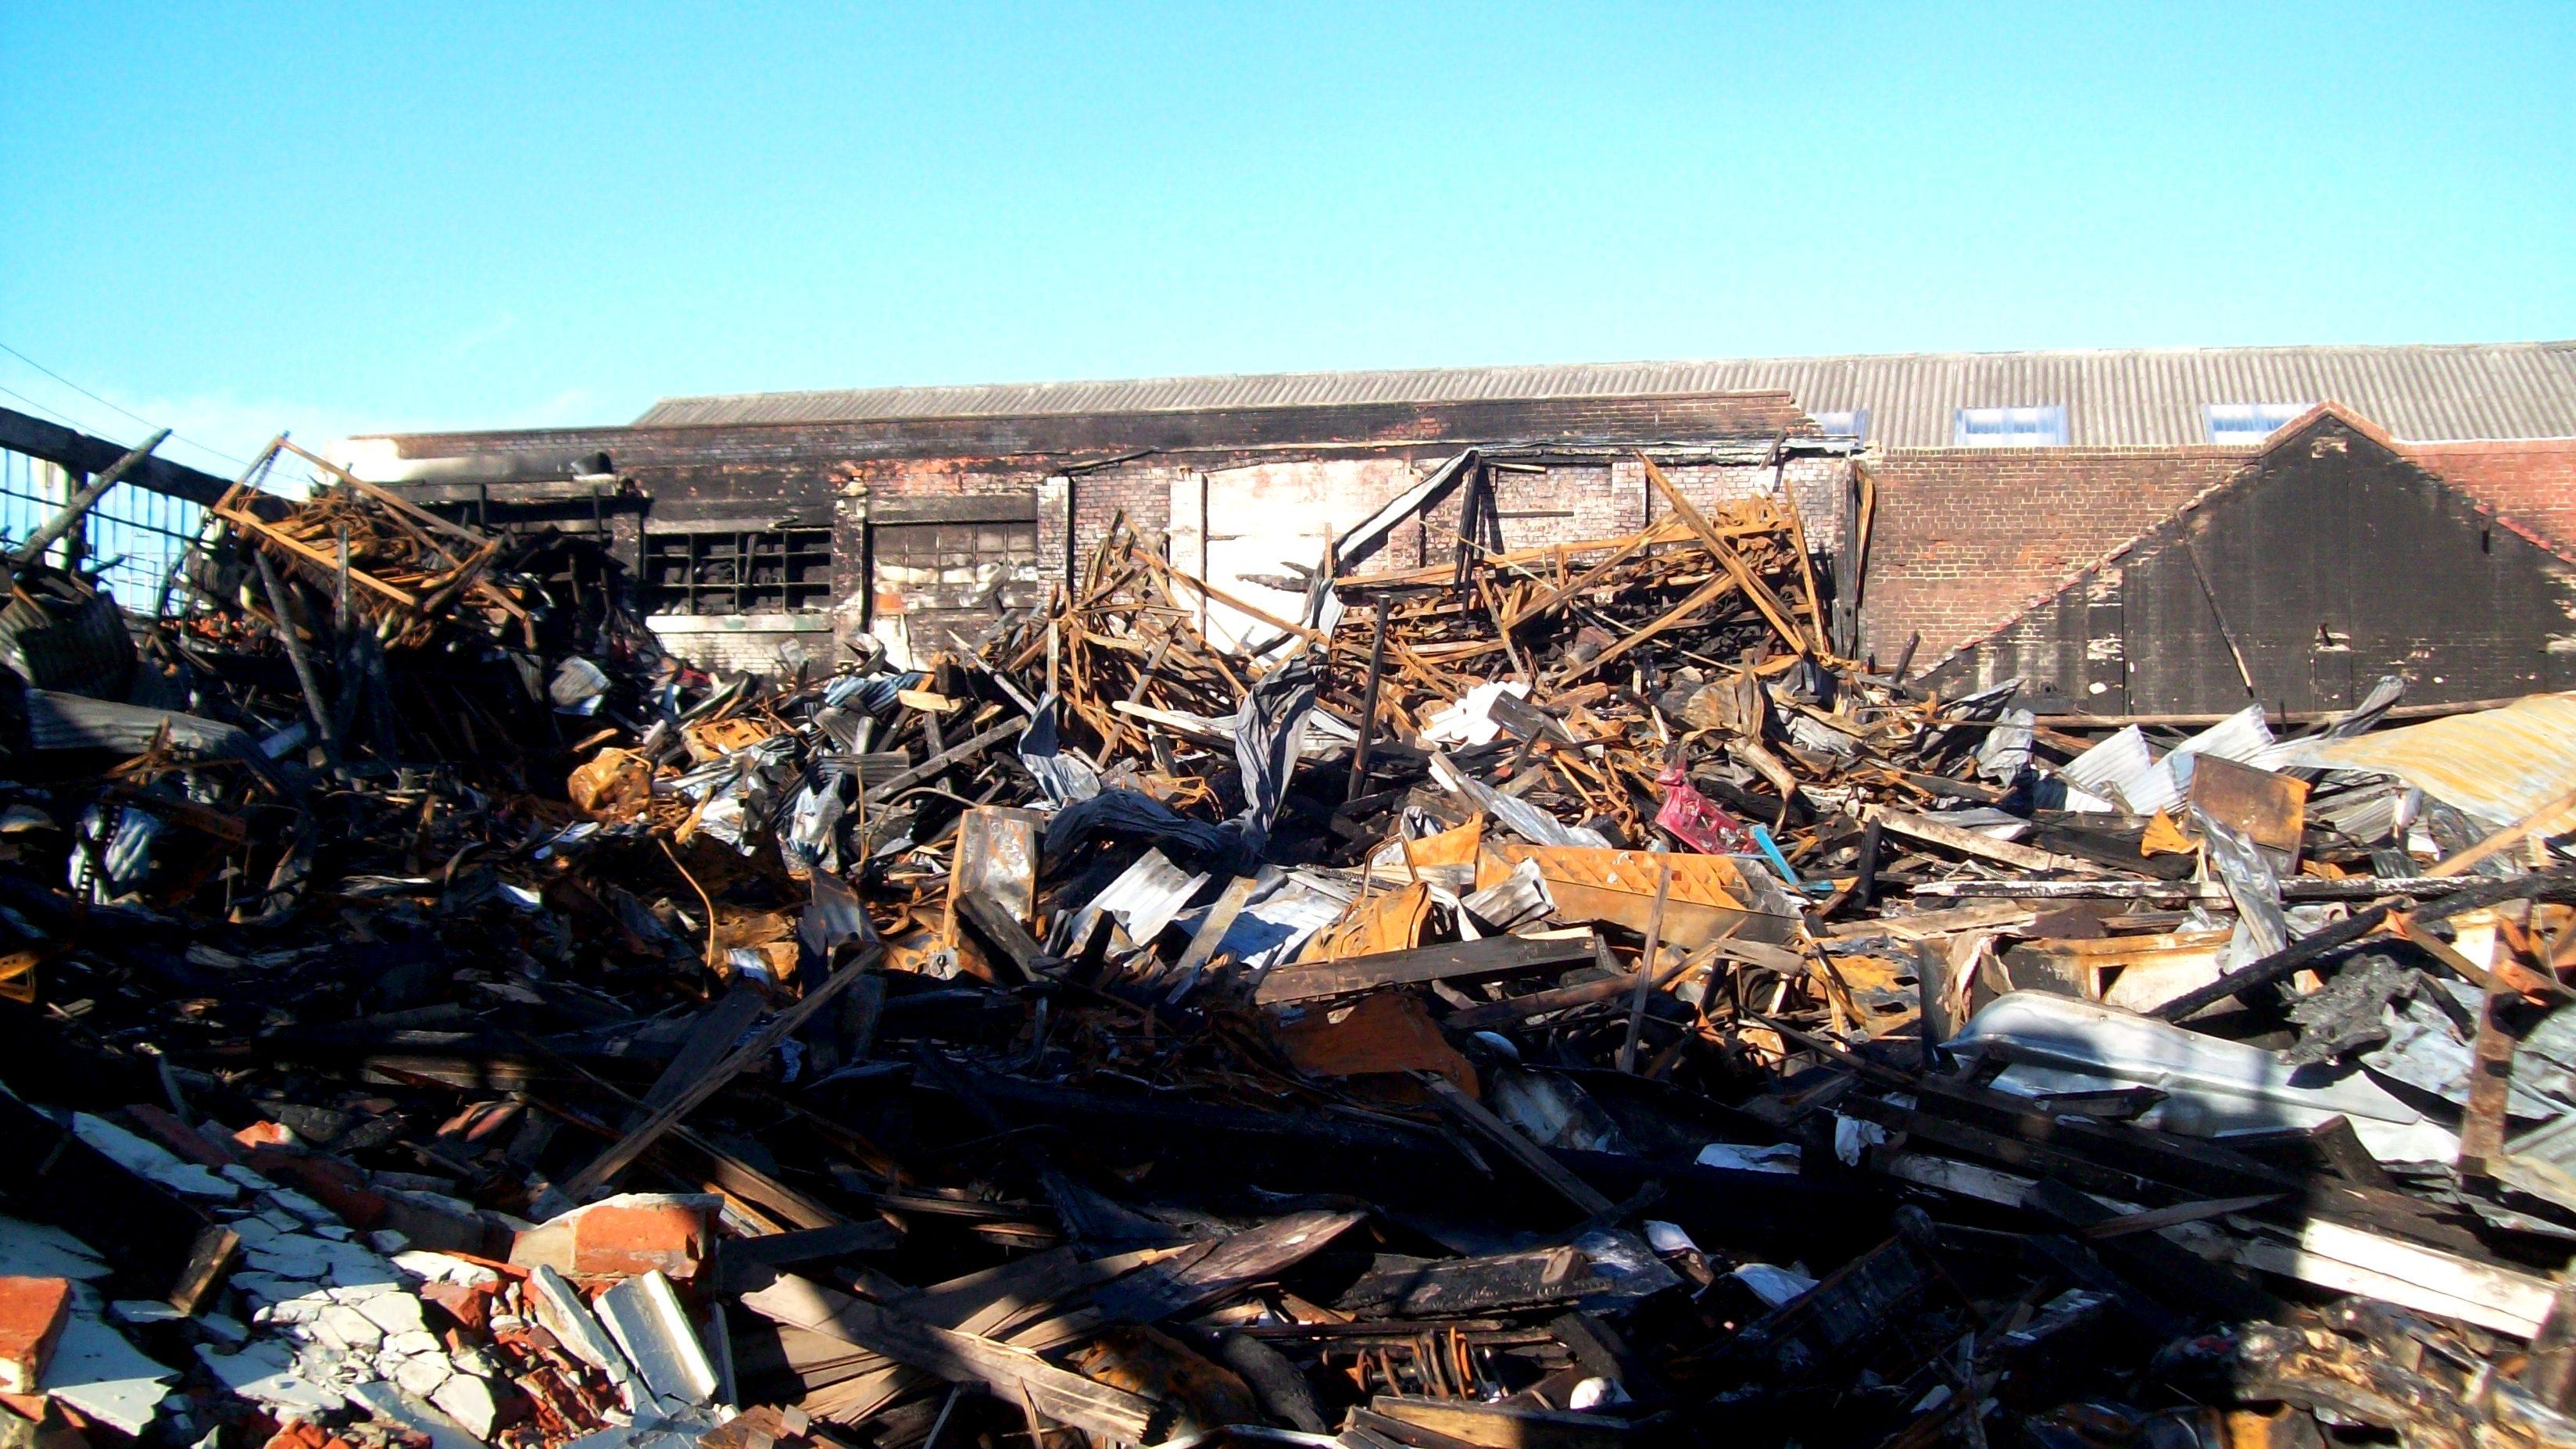 Twisted Metal, Oxide, Sky, Sell, Scrapyard, HQ Photo